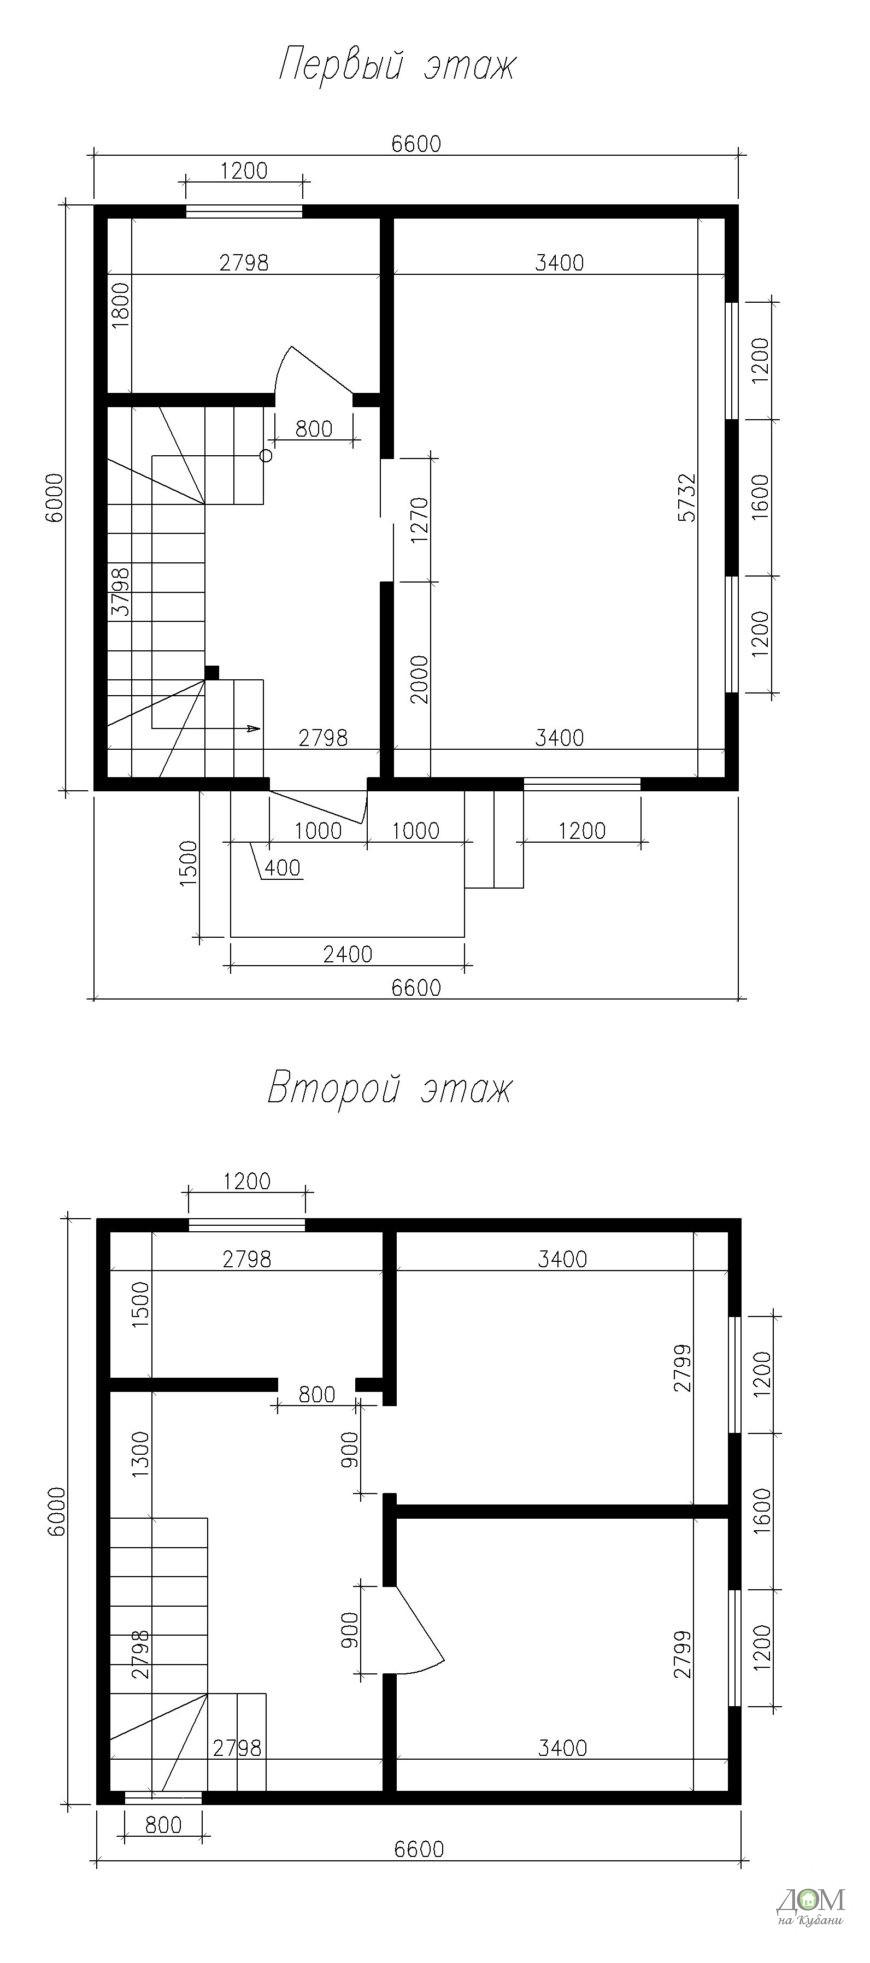 complete-sip-14-54-plan79